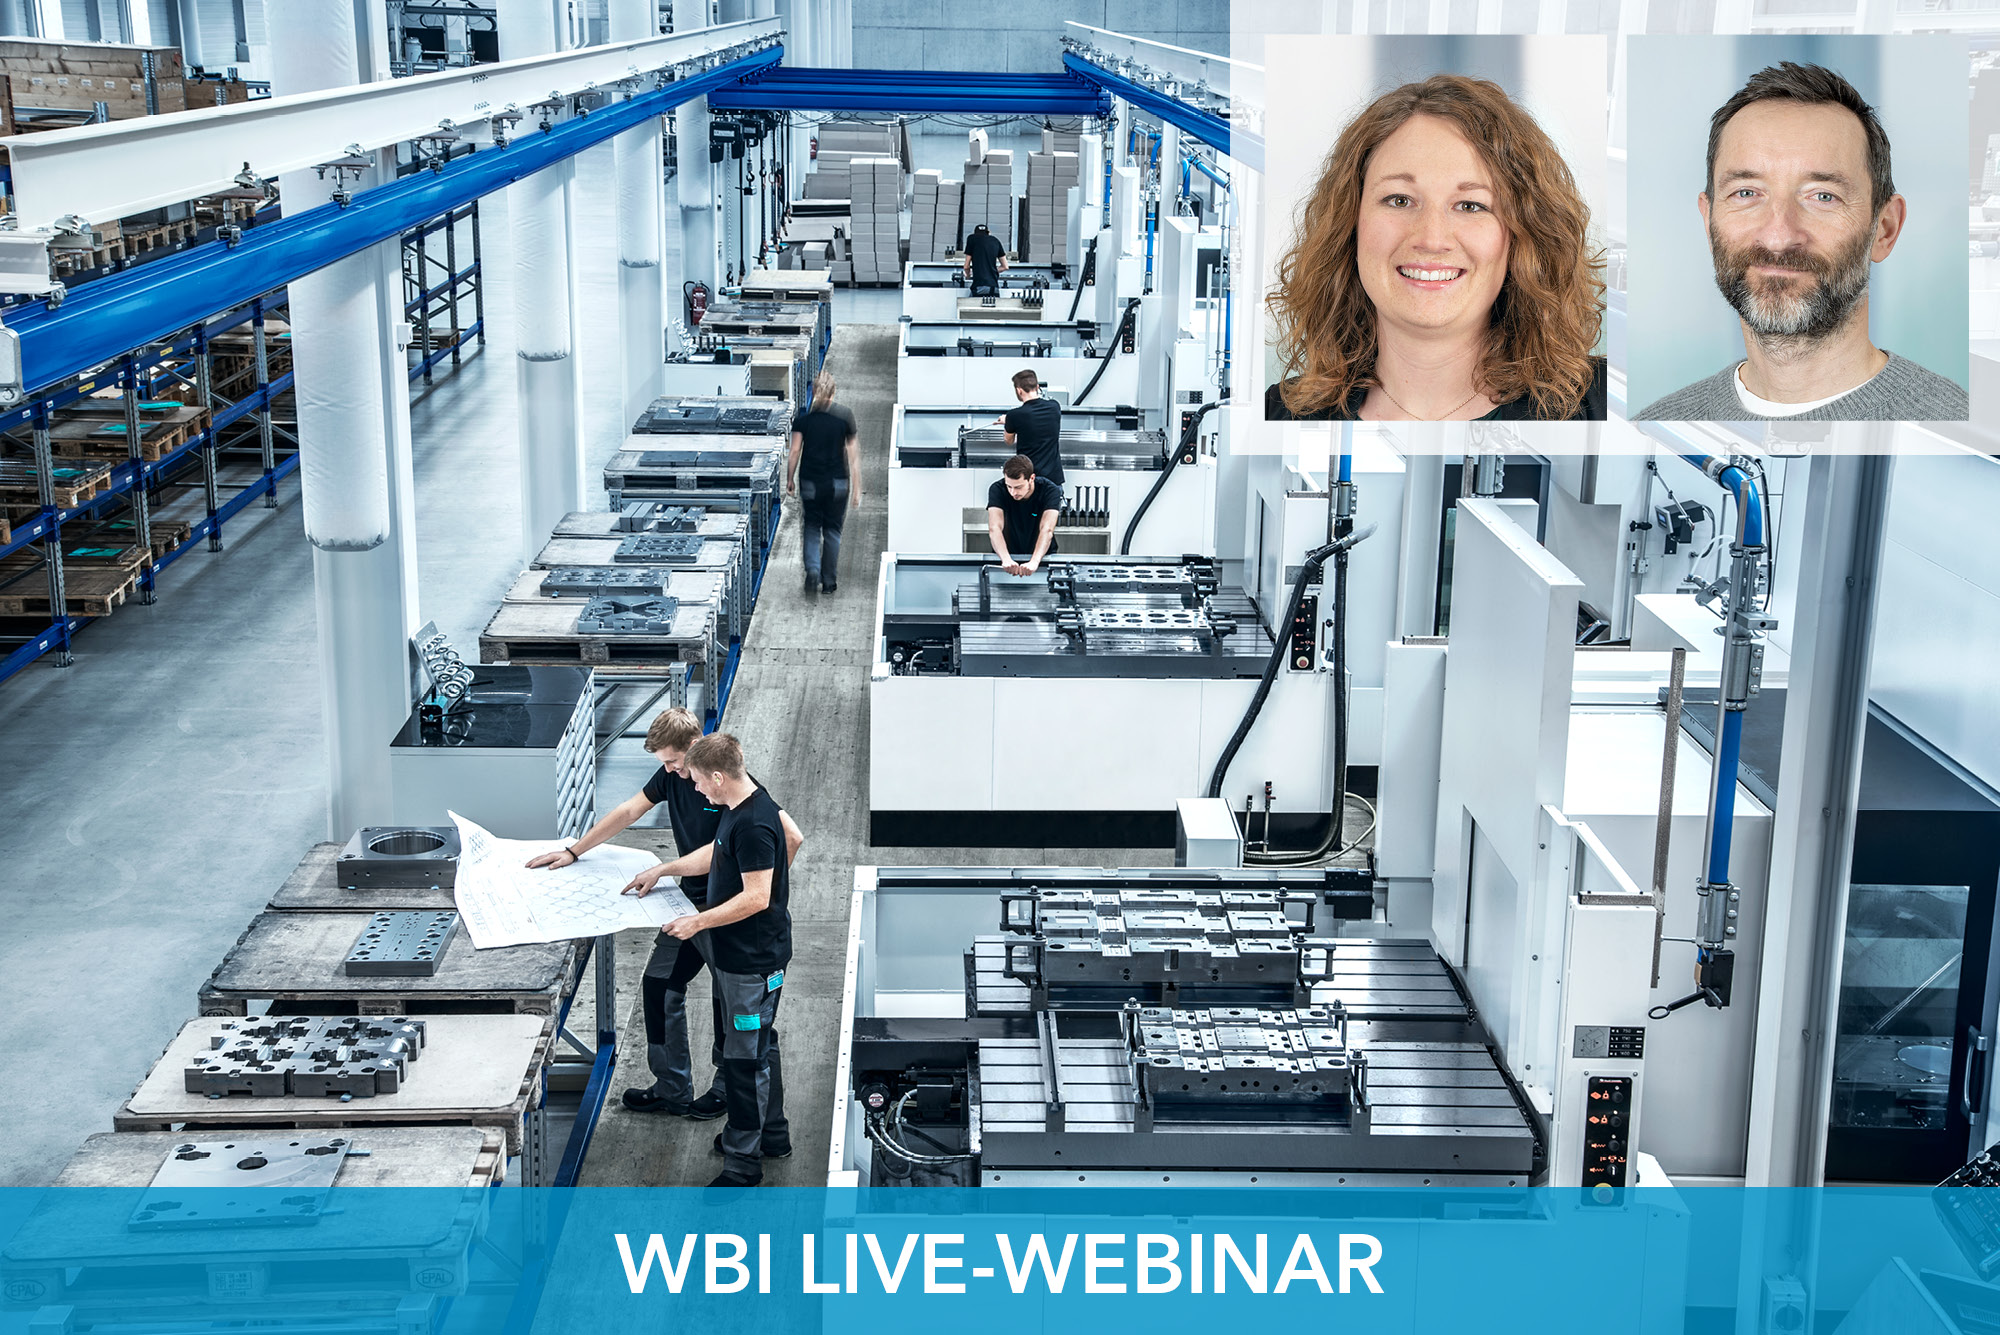 WBI-Webinar-Formenbau-Werkzeugbau